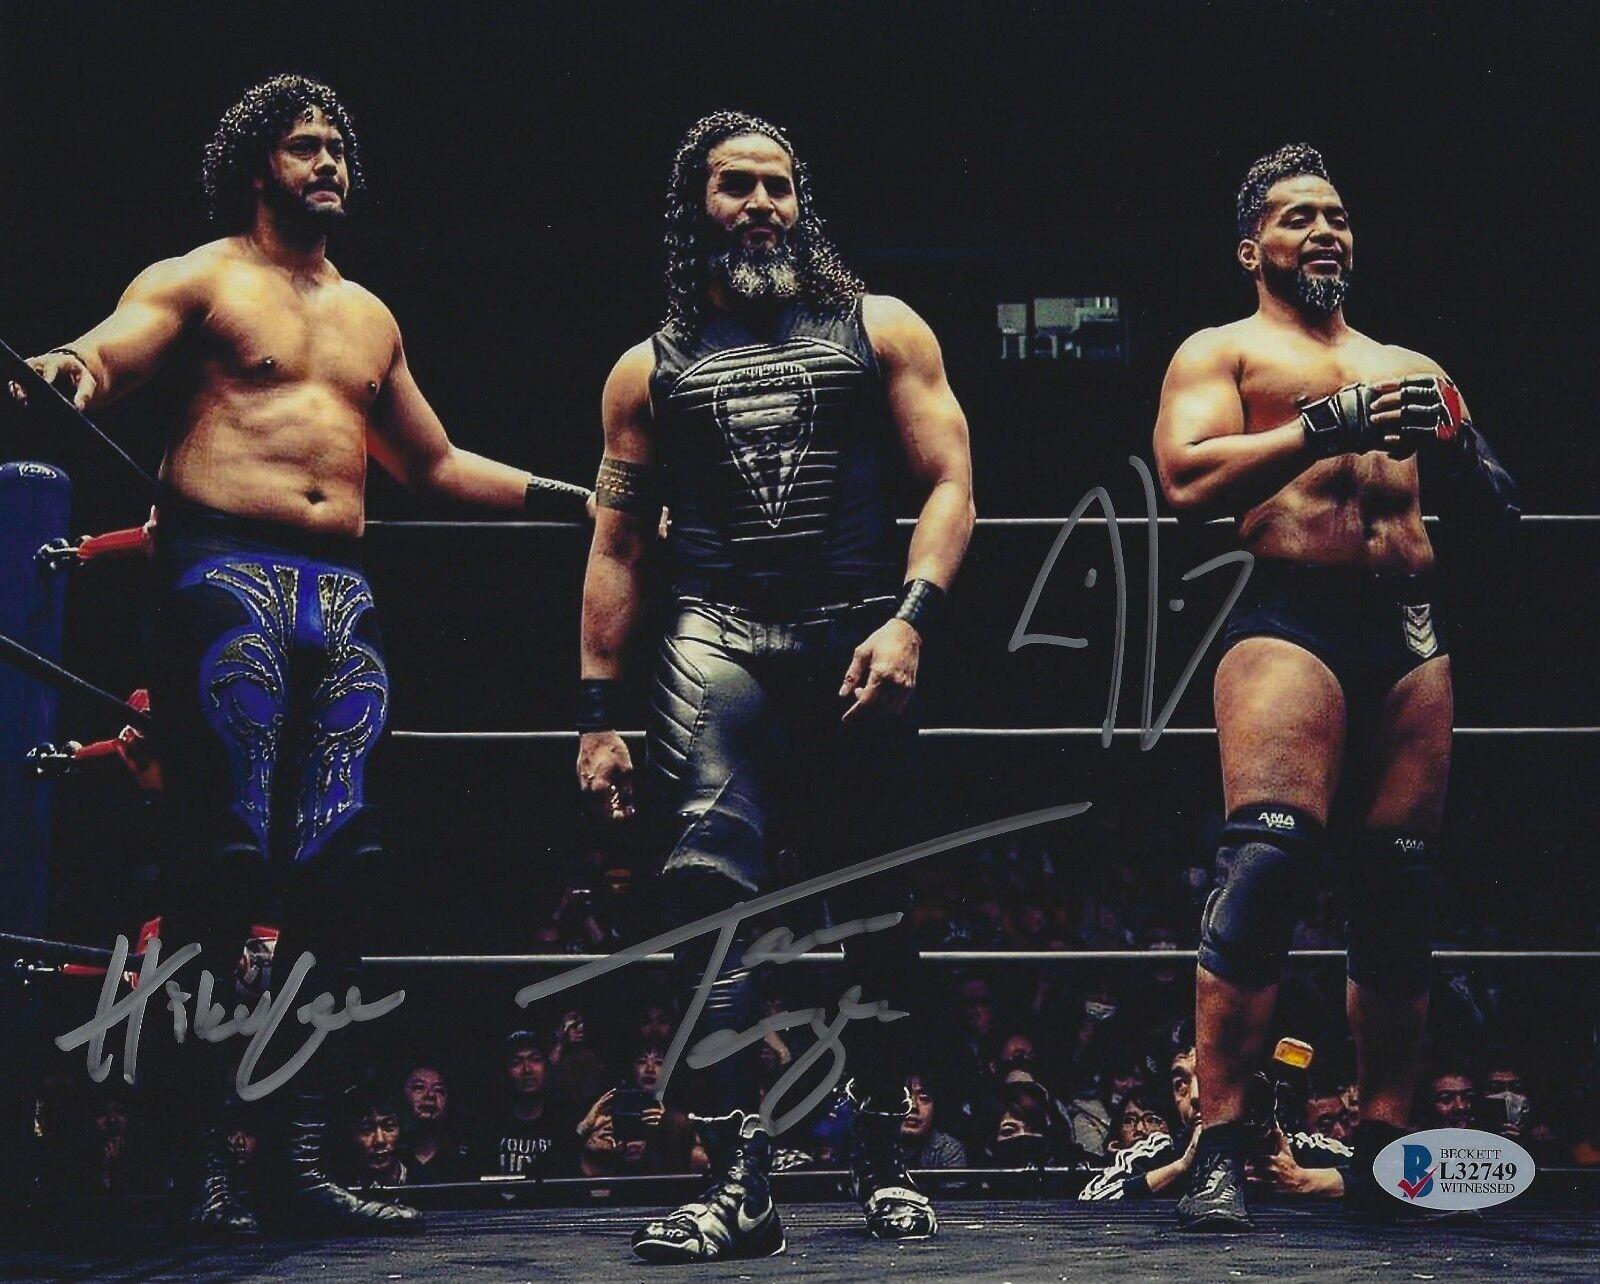 Tama Tonga Tanga loa hikuleo signed 8x10 Photo Bas cert. de autenticidad New Japan Pro Wrestling 3